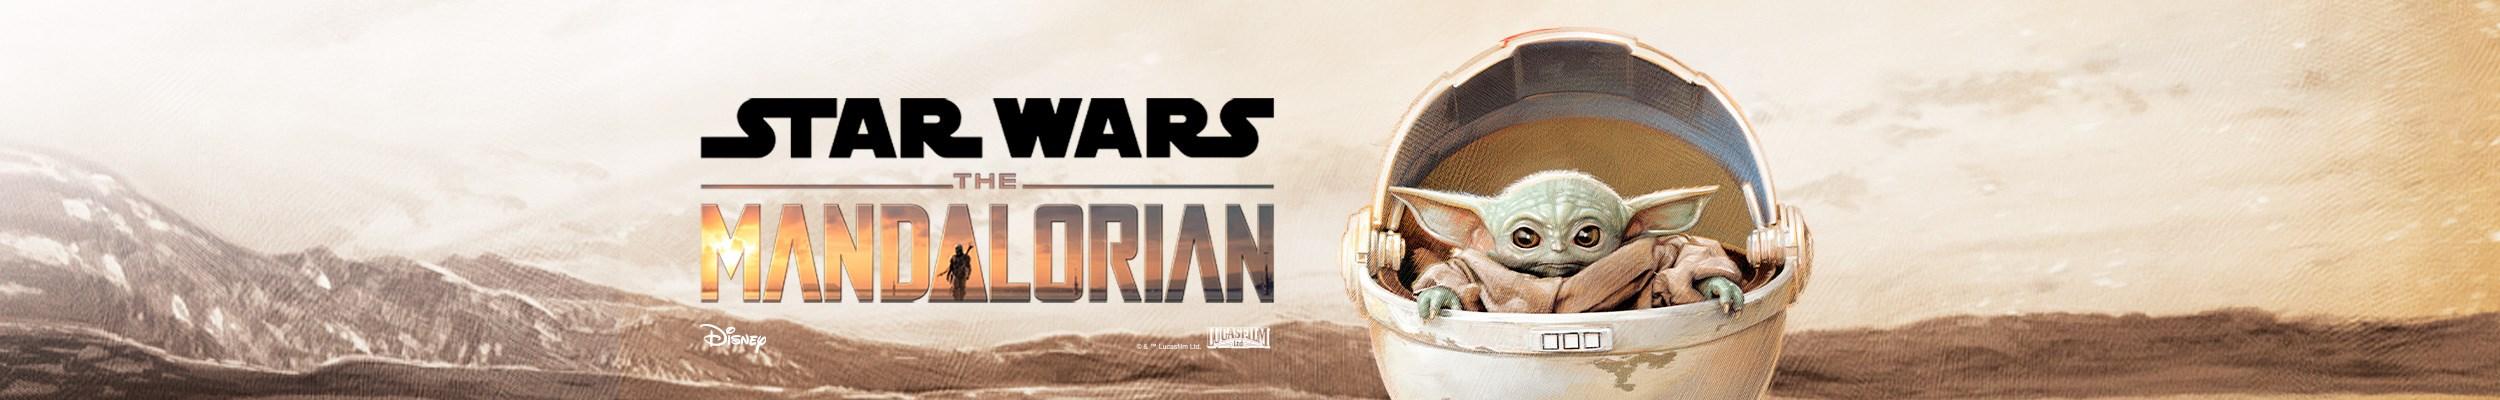 Banner principal star wars